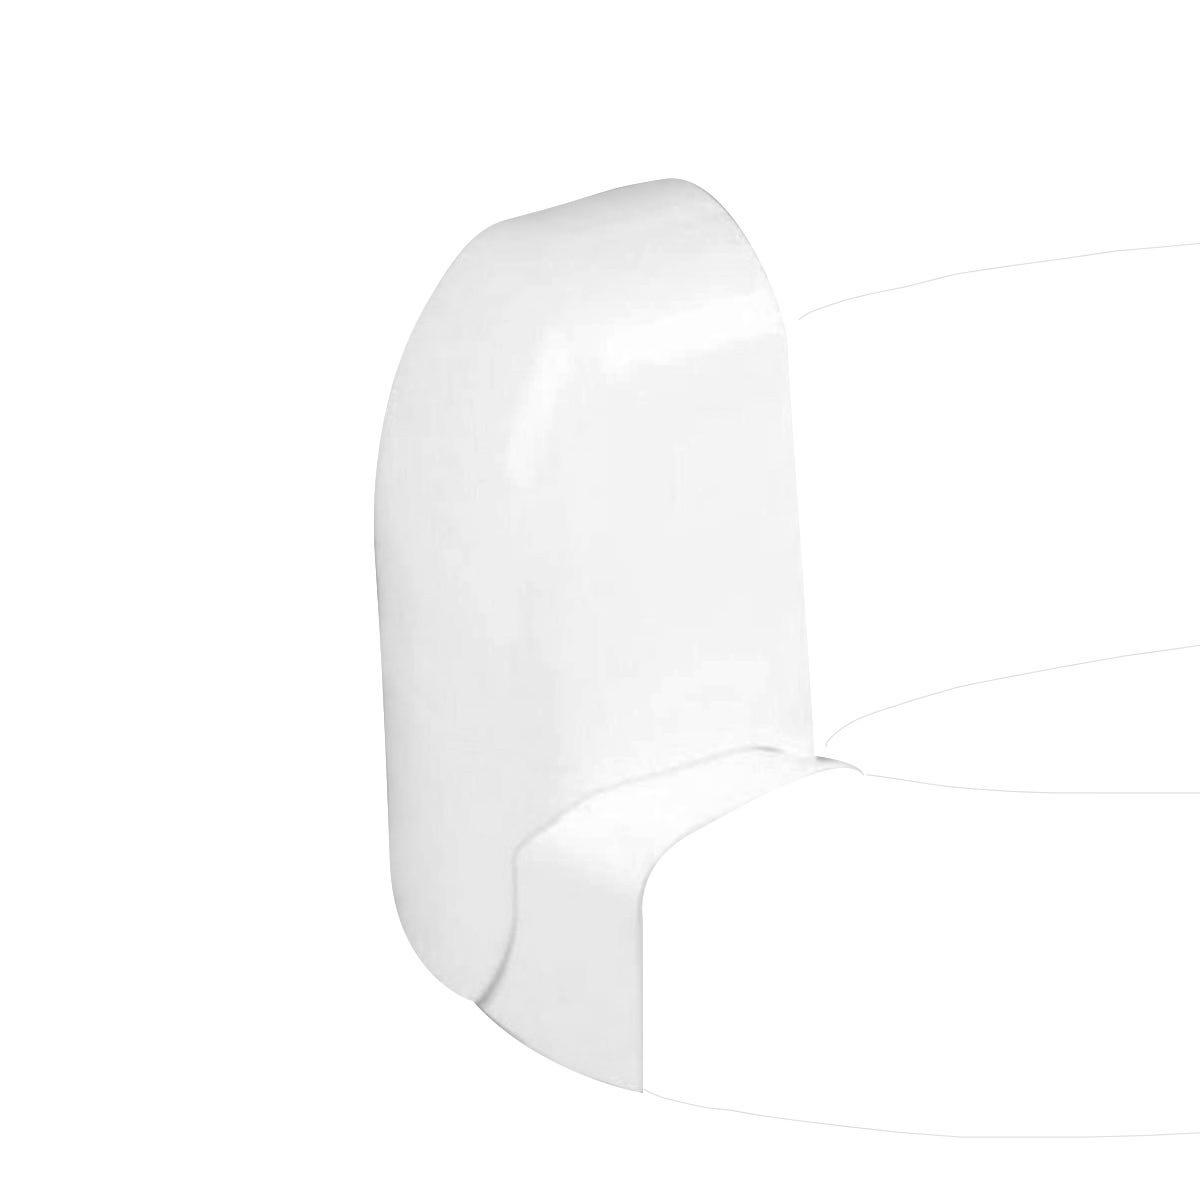 Toilet Seat Splash Guard